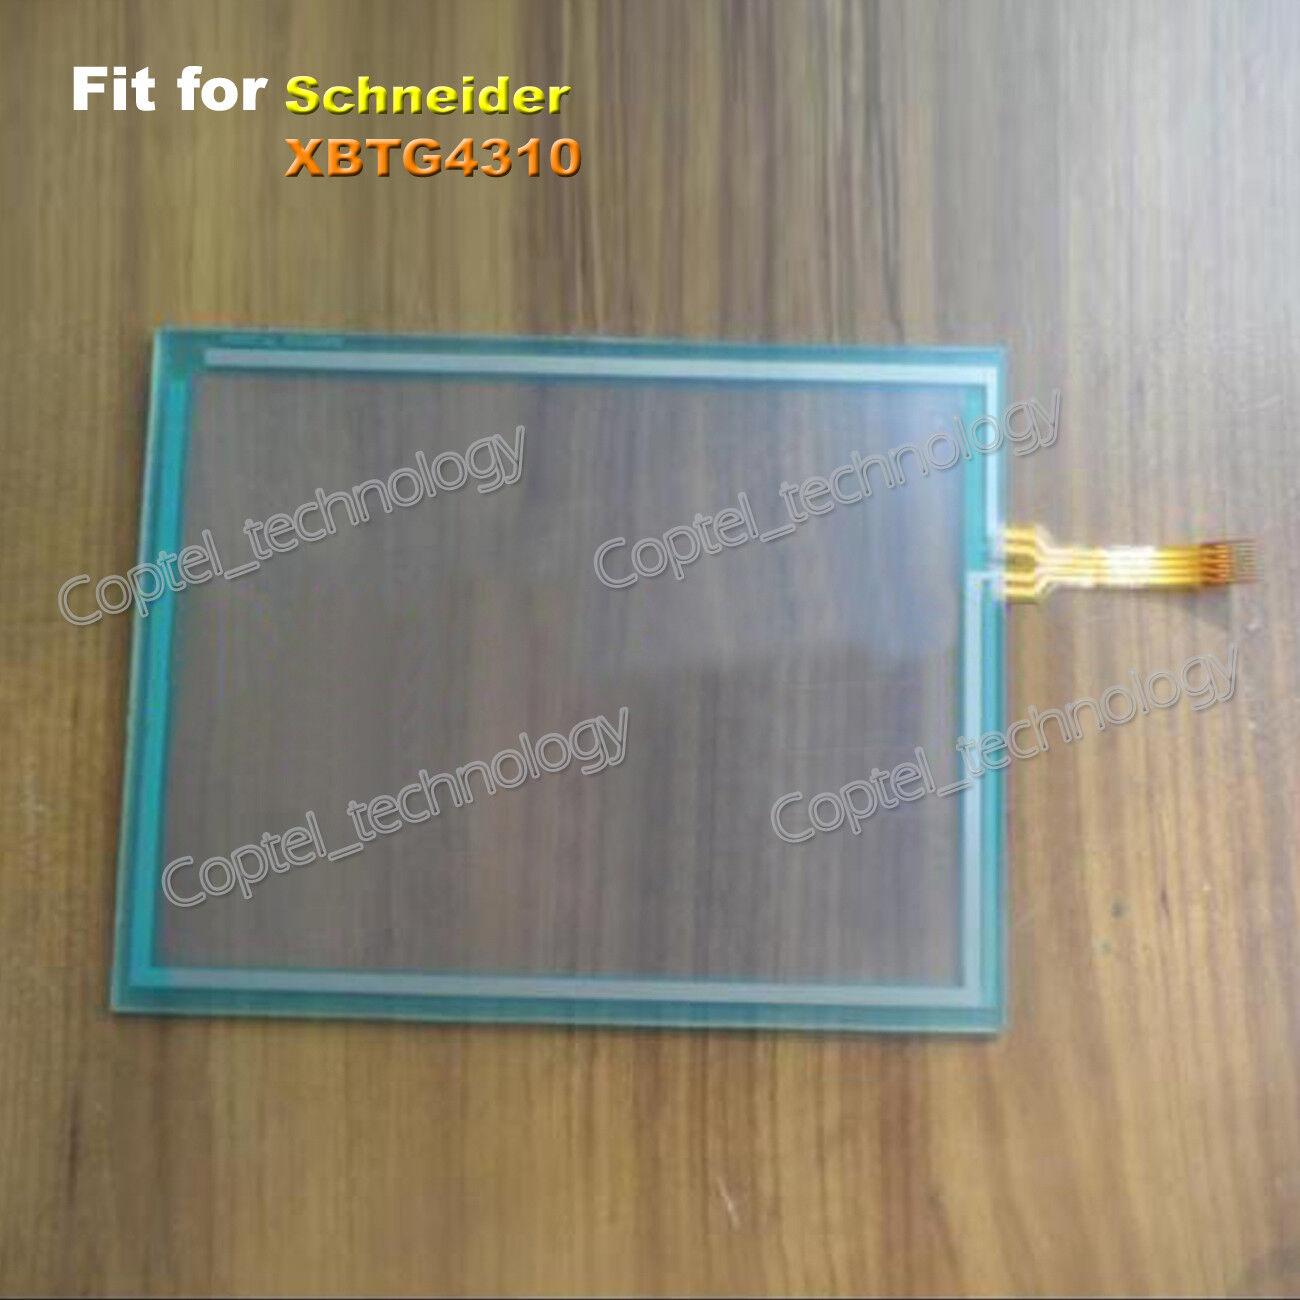 Touch Screen Glass for Schneider XBTG4310 XBT G4310 One Year Quality Warranty